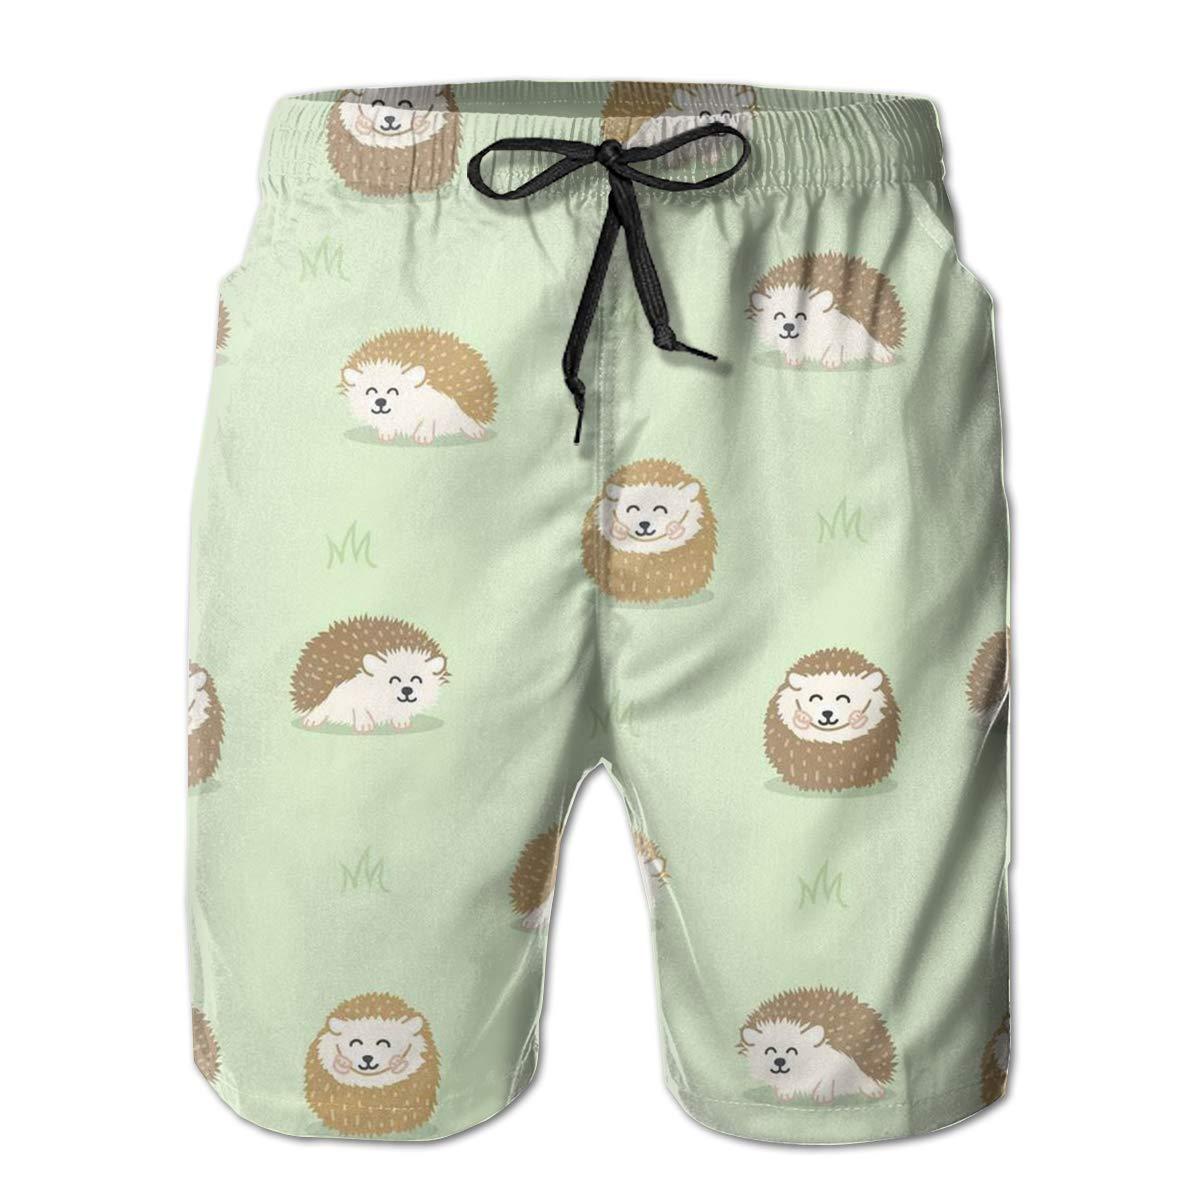 LDFUMG Cartoon Hedgehog Mens Beach Board Shorts Quick Dry Summer Casual Swimming Soft Fabric with Pocket